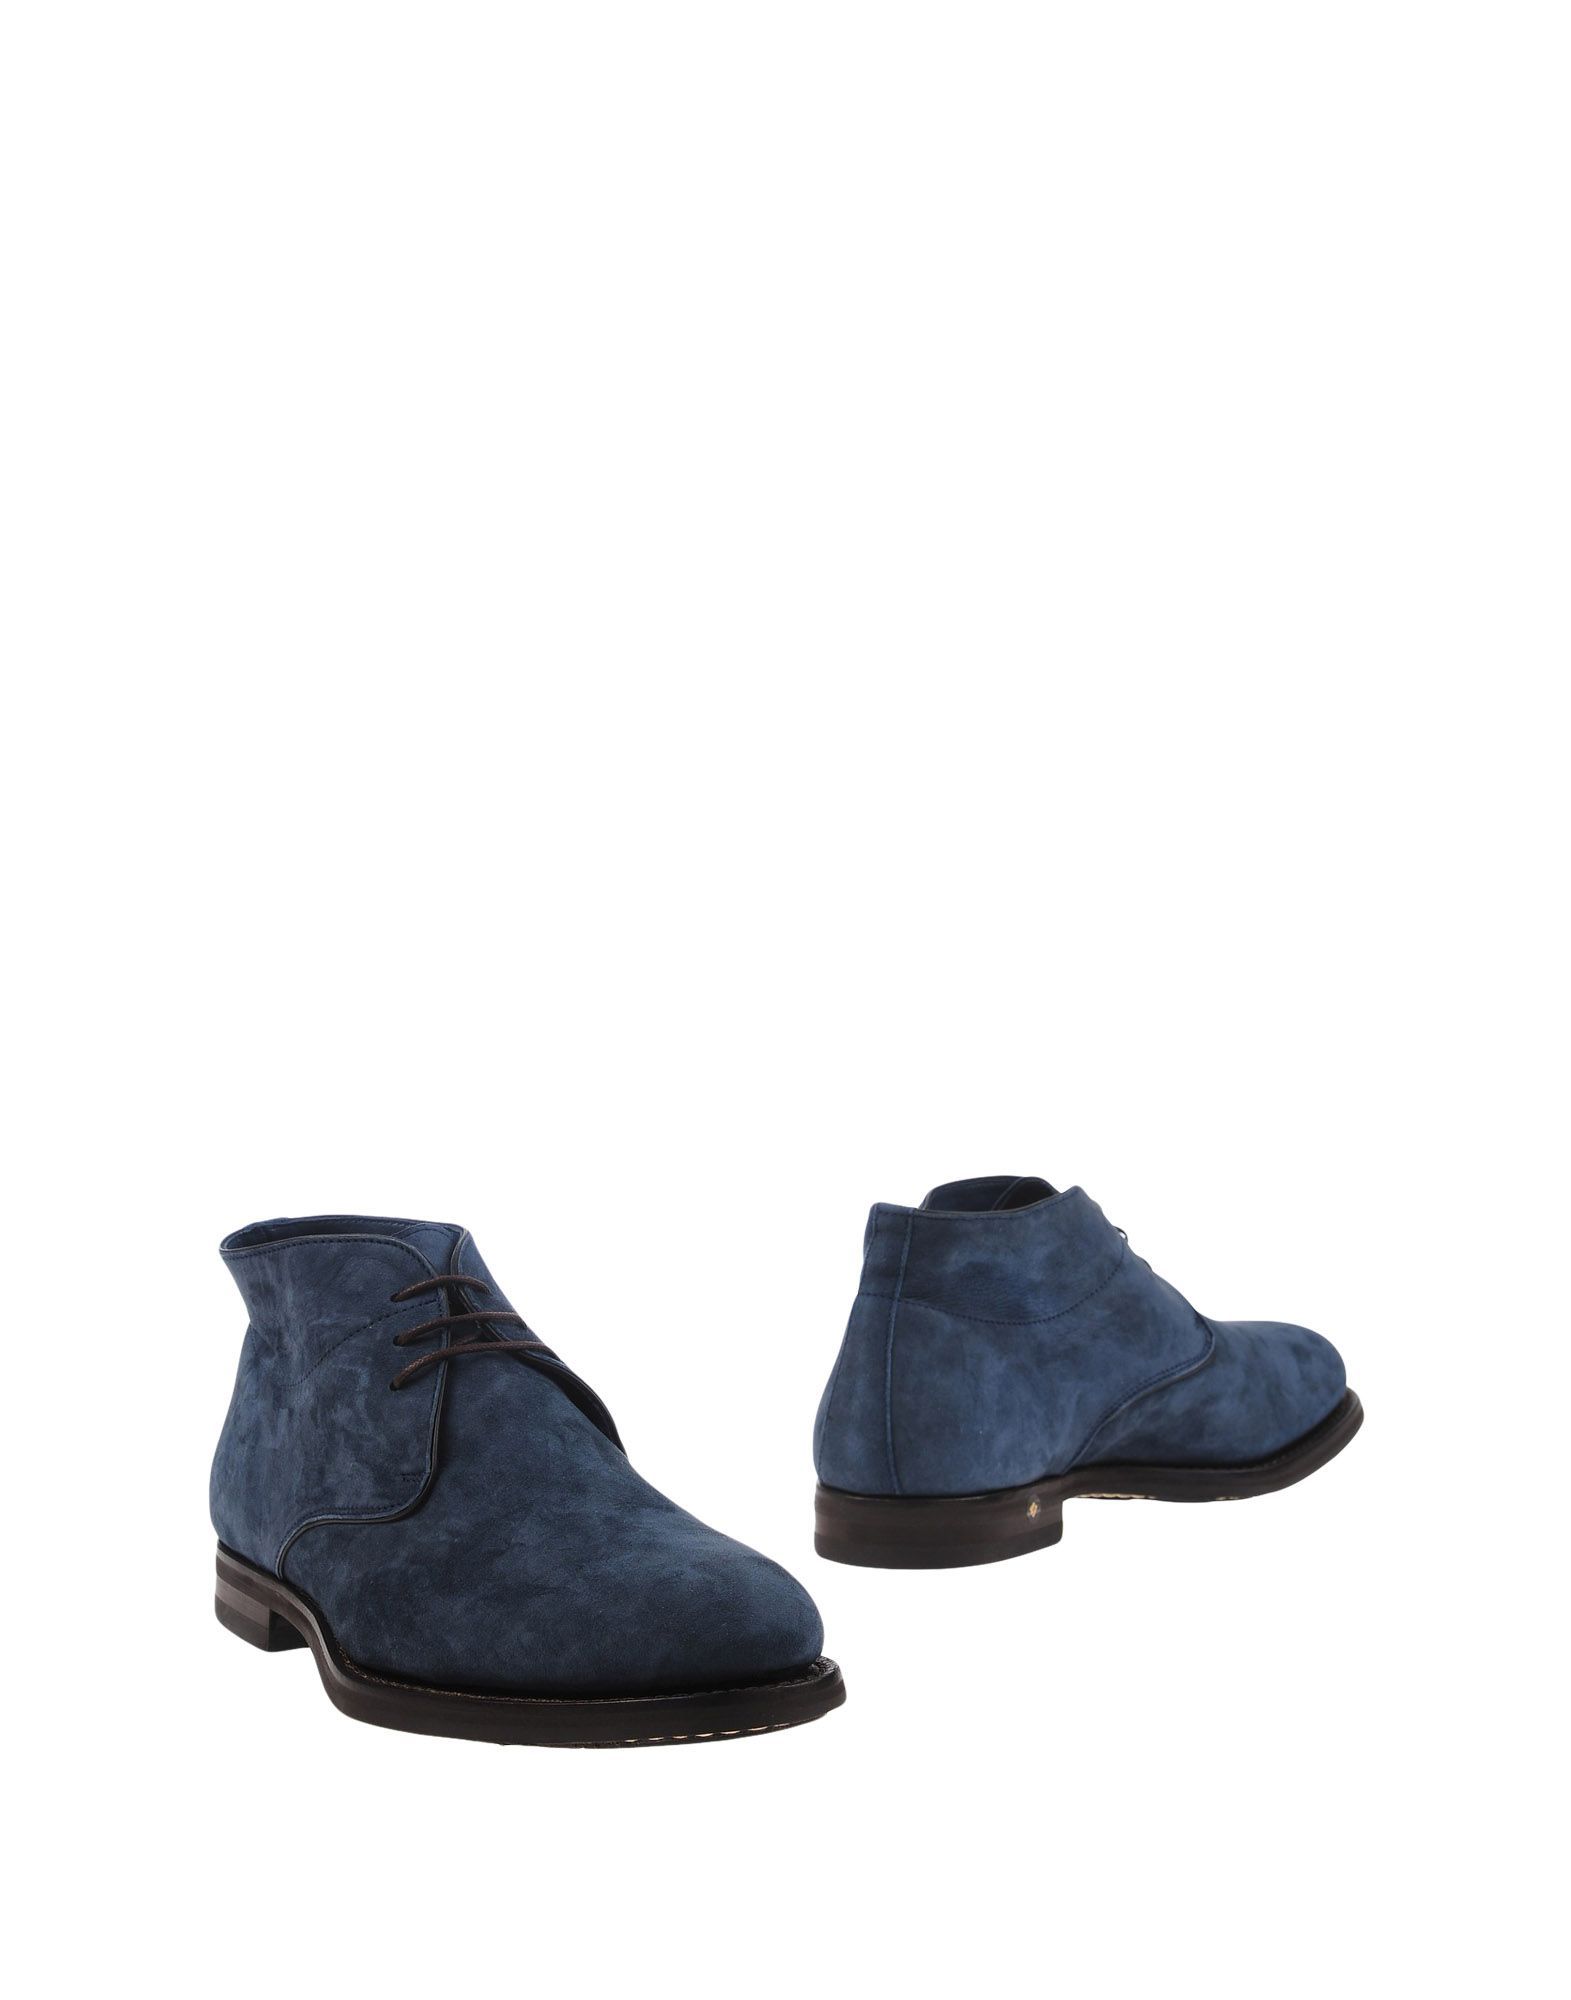 ANDREA VENTURA FIRENZE Полусапоги и высокие ботинки